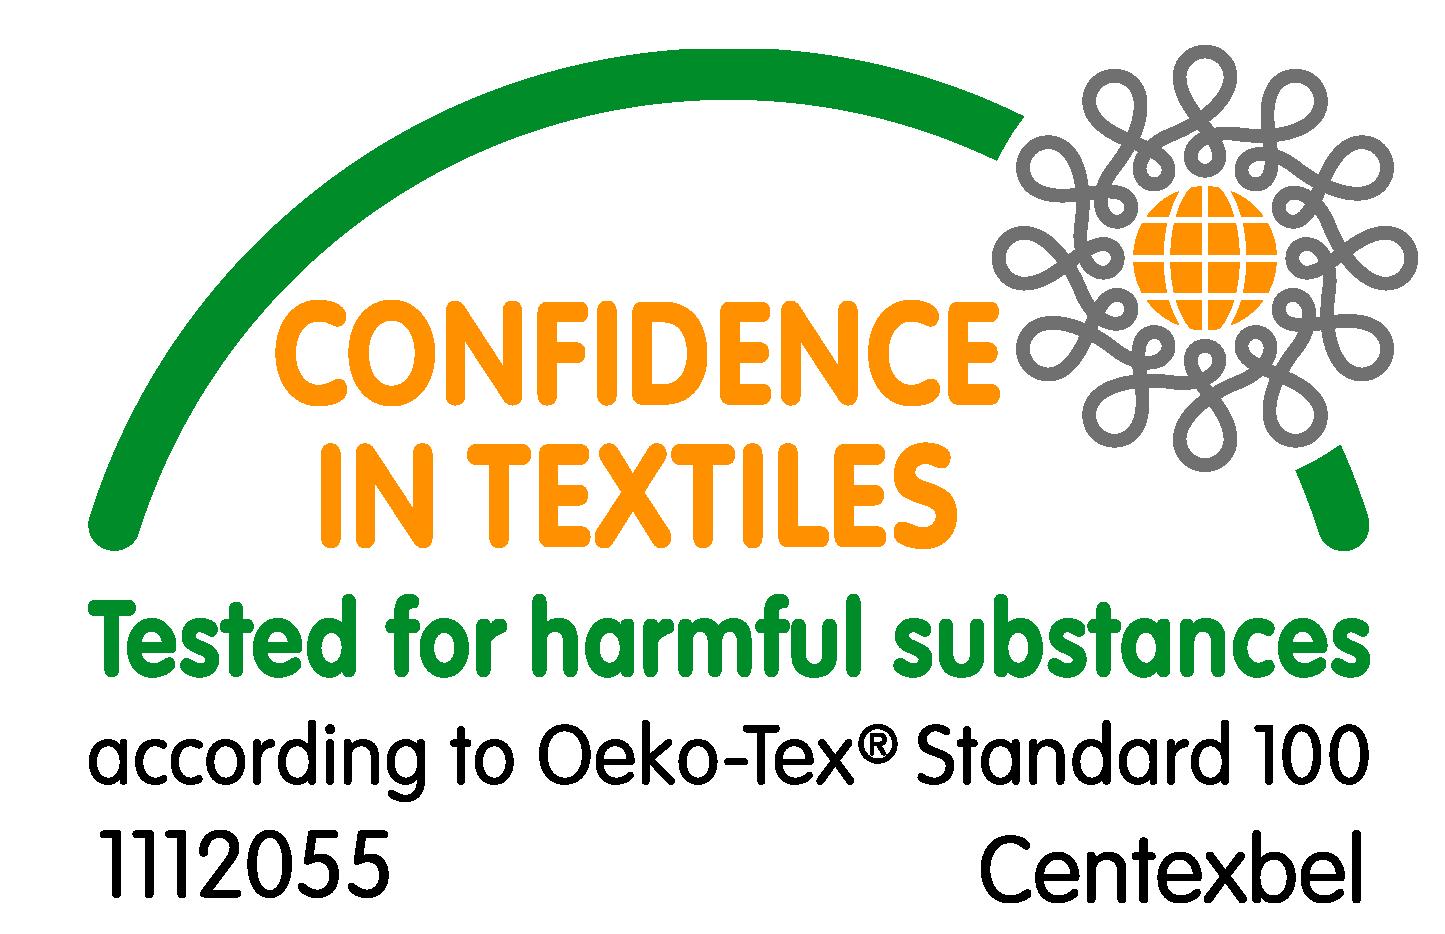 ConfidenceInTextiles.png